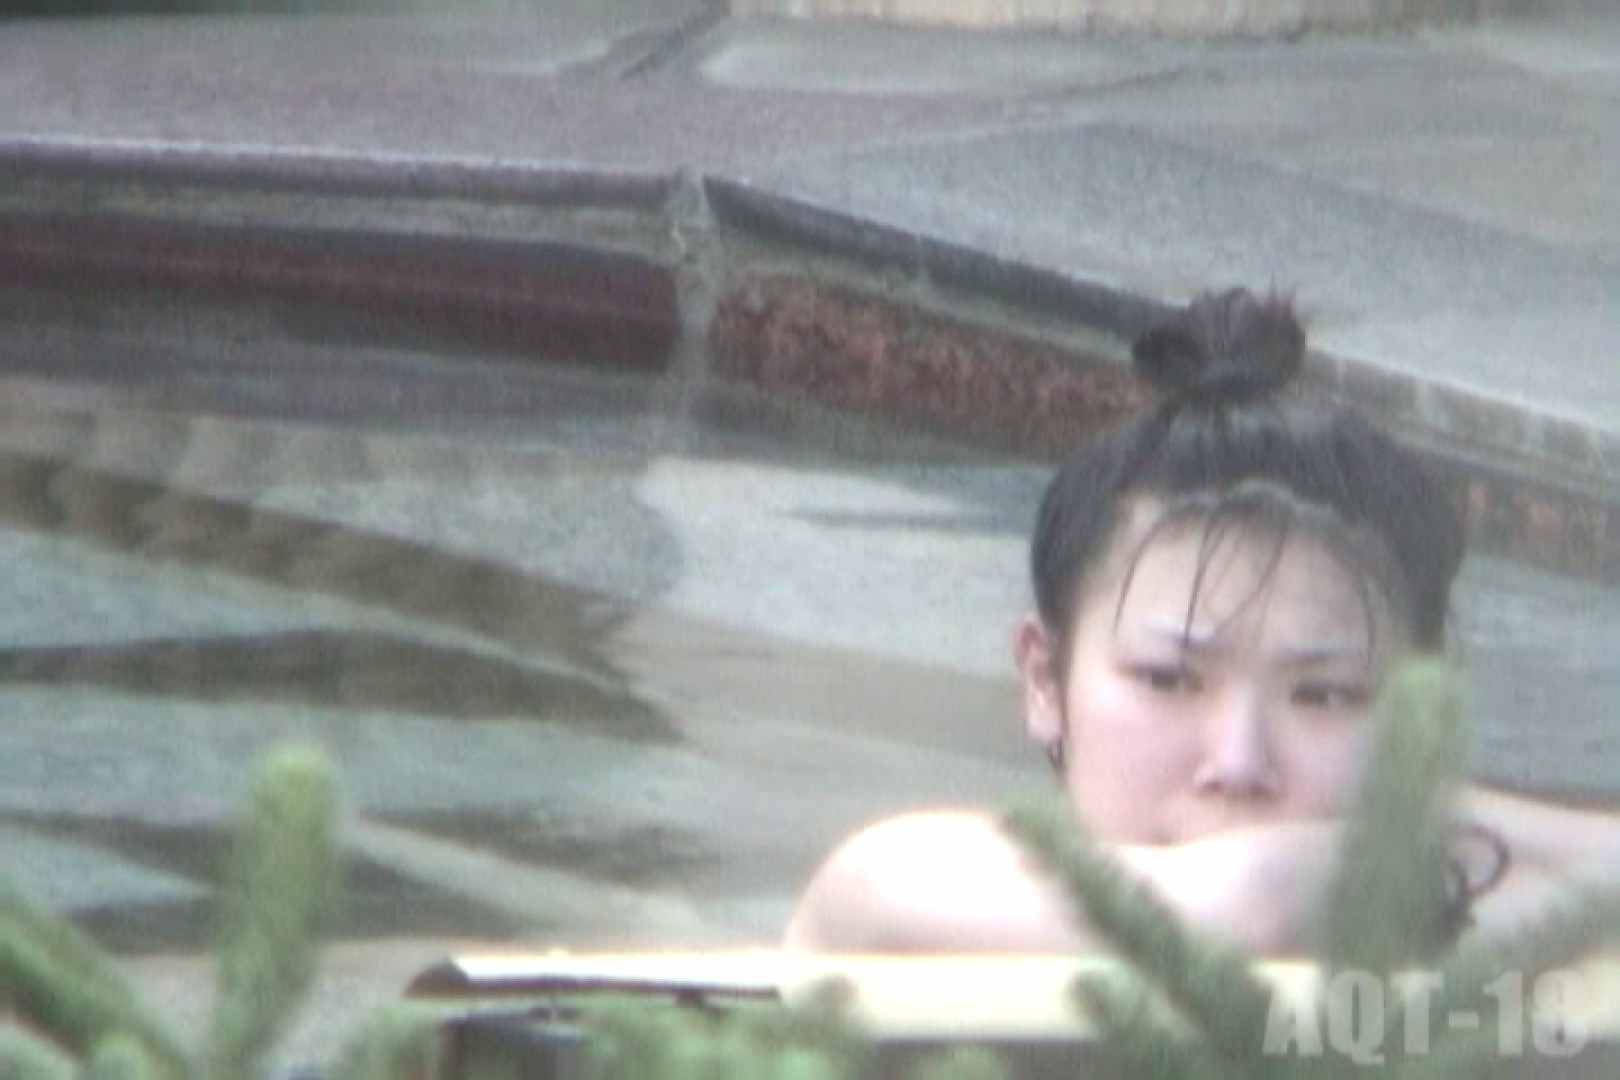 Aquaな露天風呂Vol.855 露天風呂編  86PIX 86